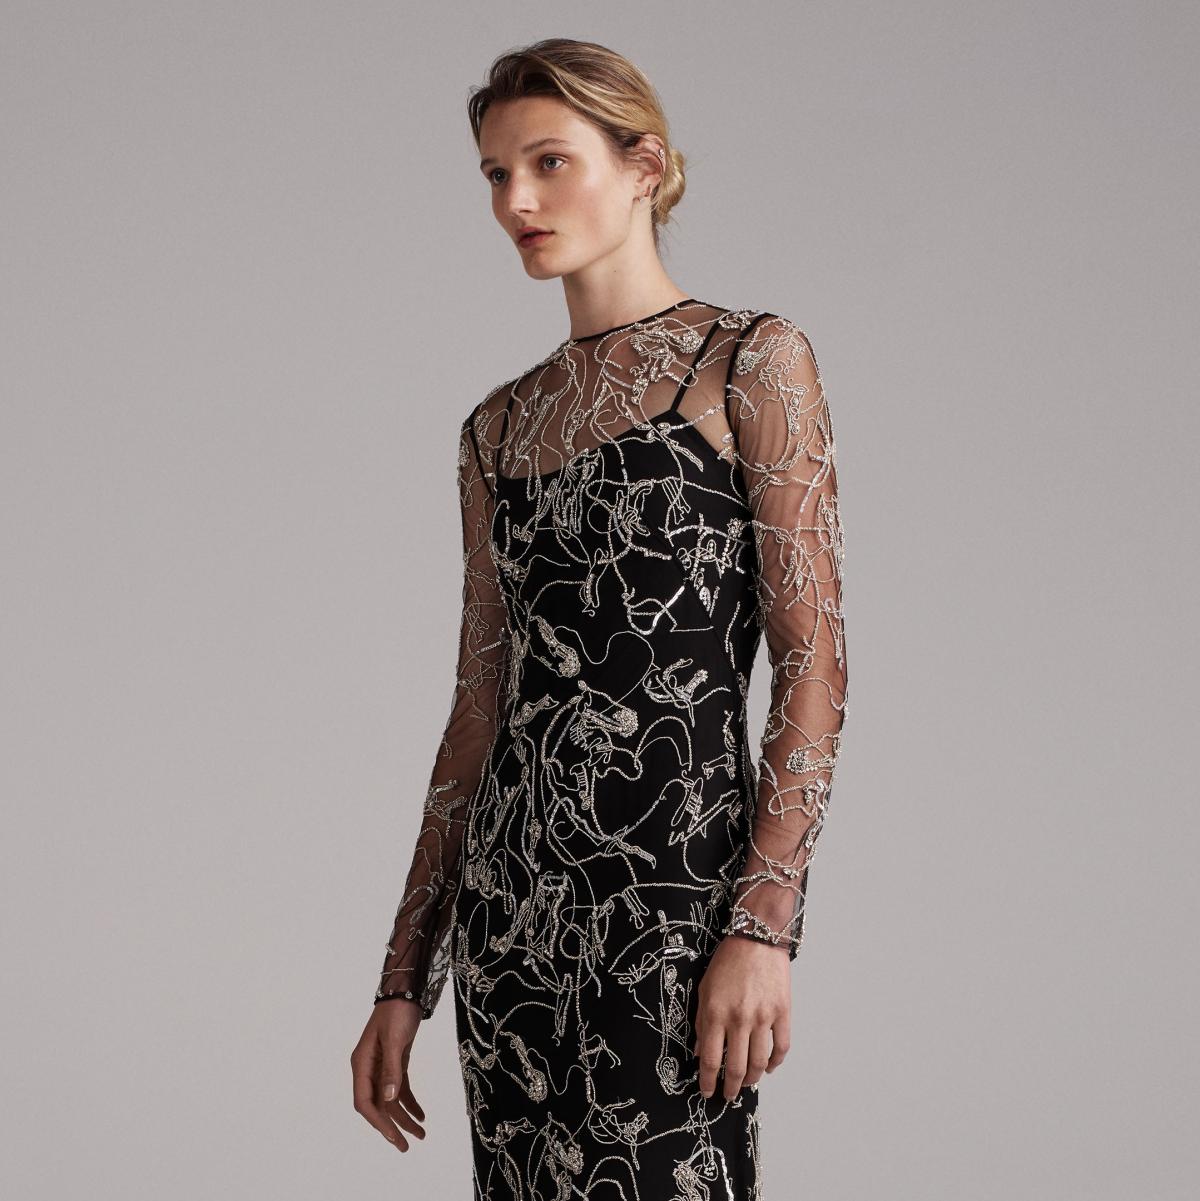 Elizabeth Kennedy spring 2018 gown look 24 horse motif